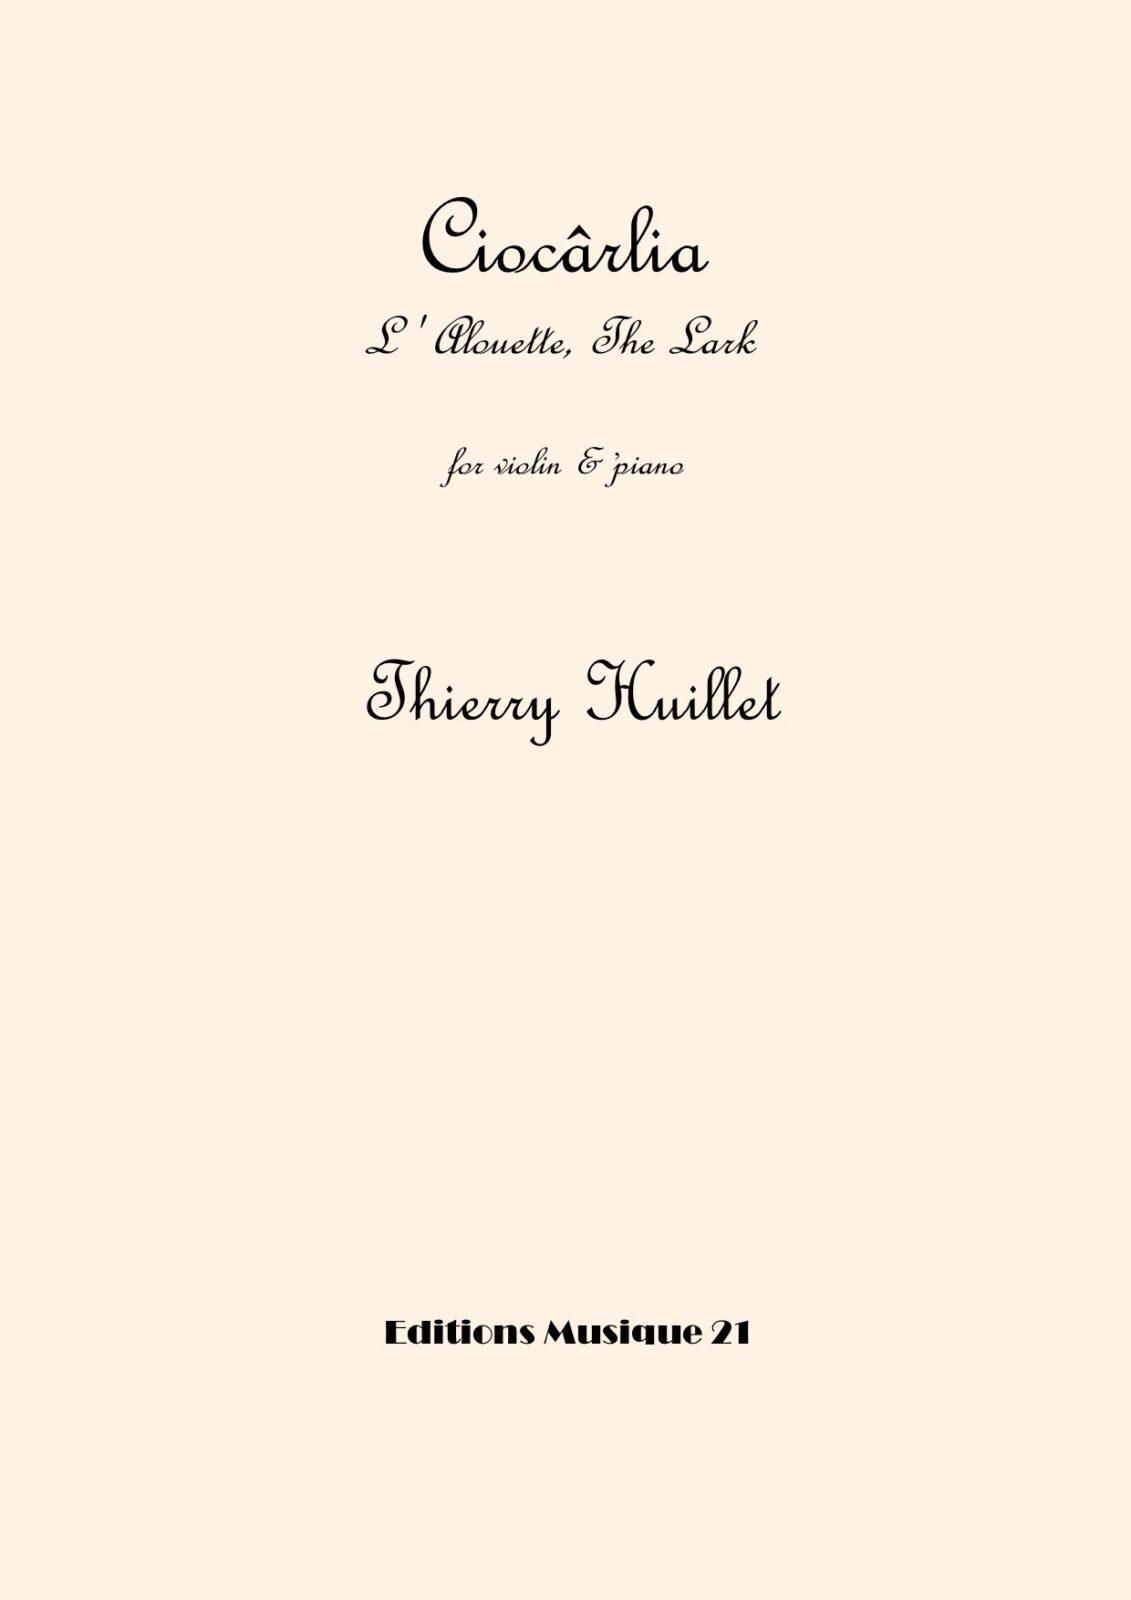 Ciocârlia (The Lark), for violin and piano